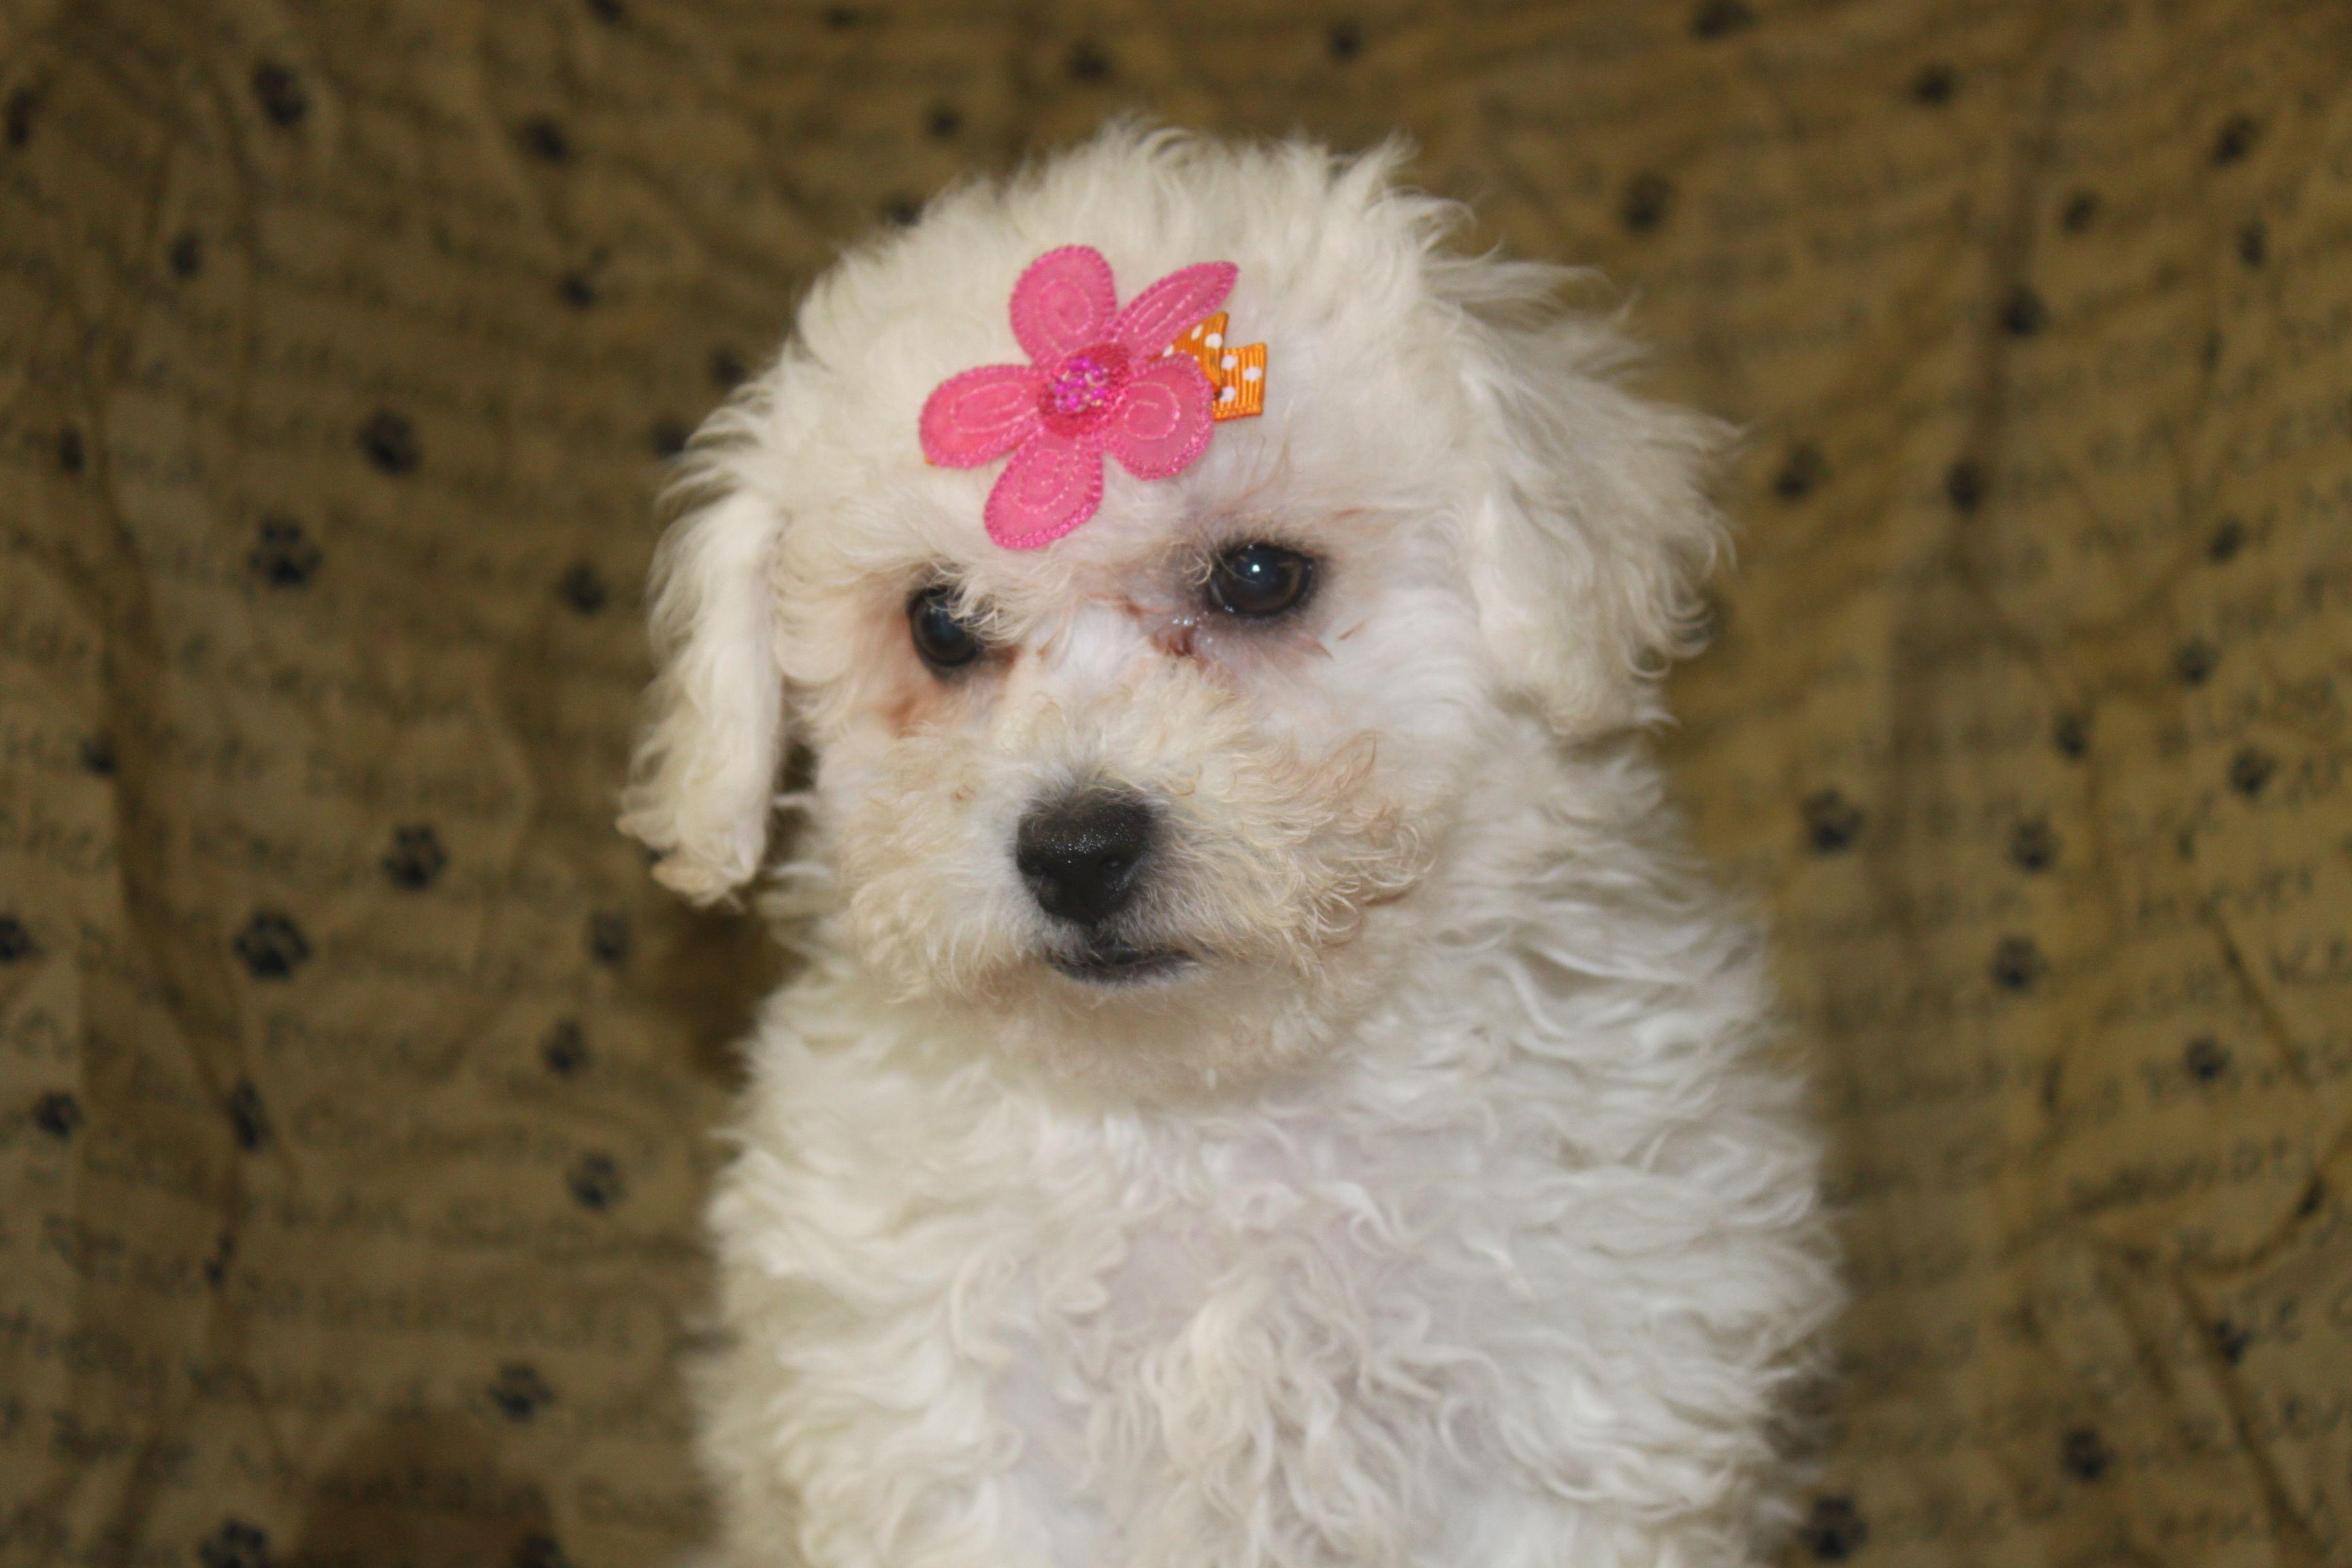 Bichon Frise Puppies For Sale In Shippensburg Pennsylvania